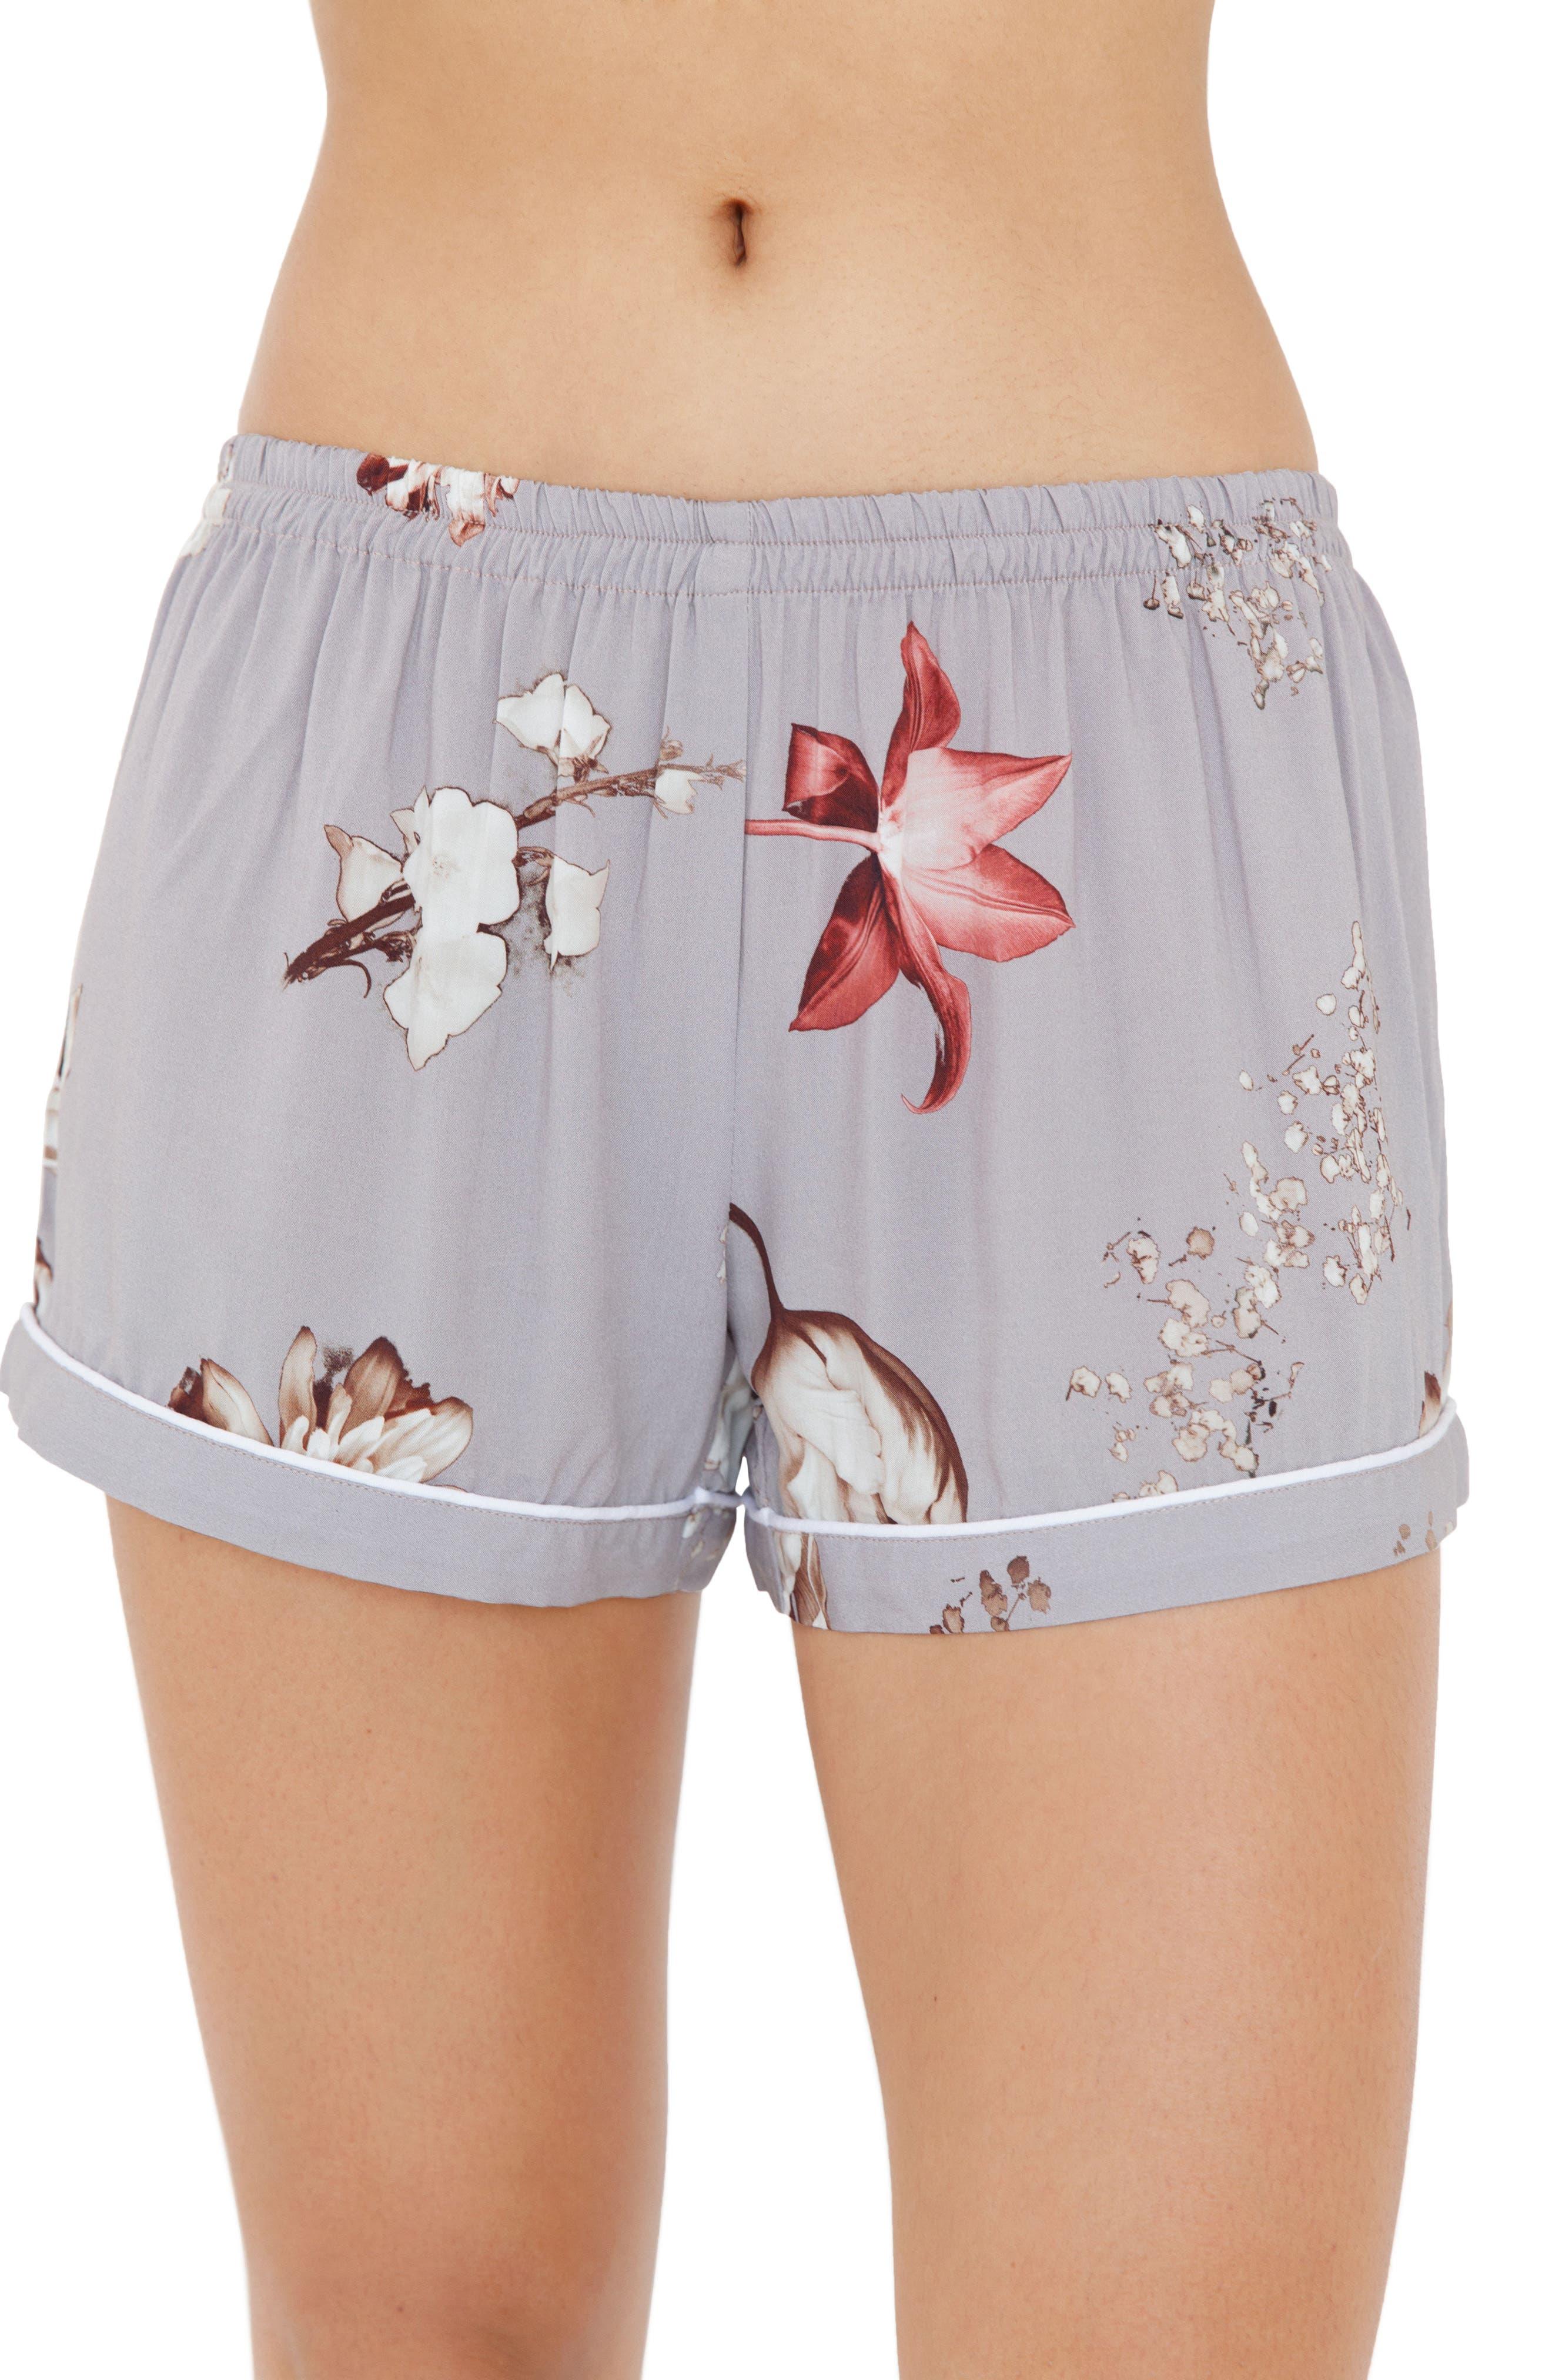 Floral Short Pajamas,                             Alternate thumbnail 3, color,                             530